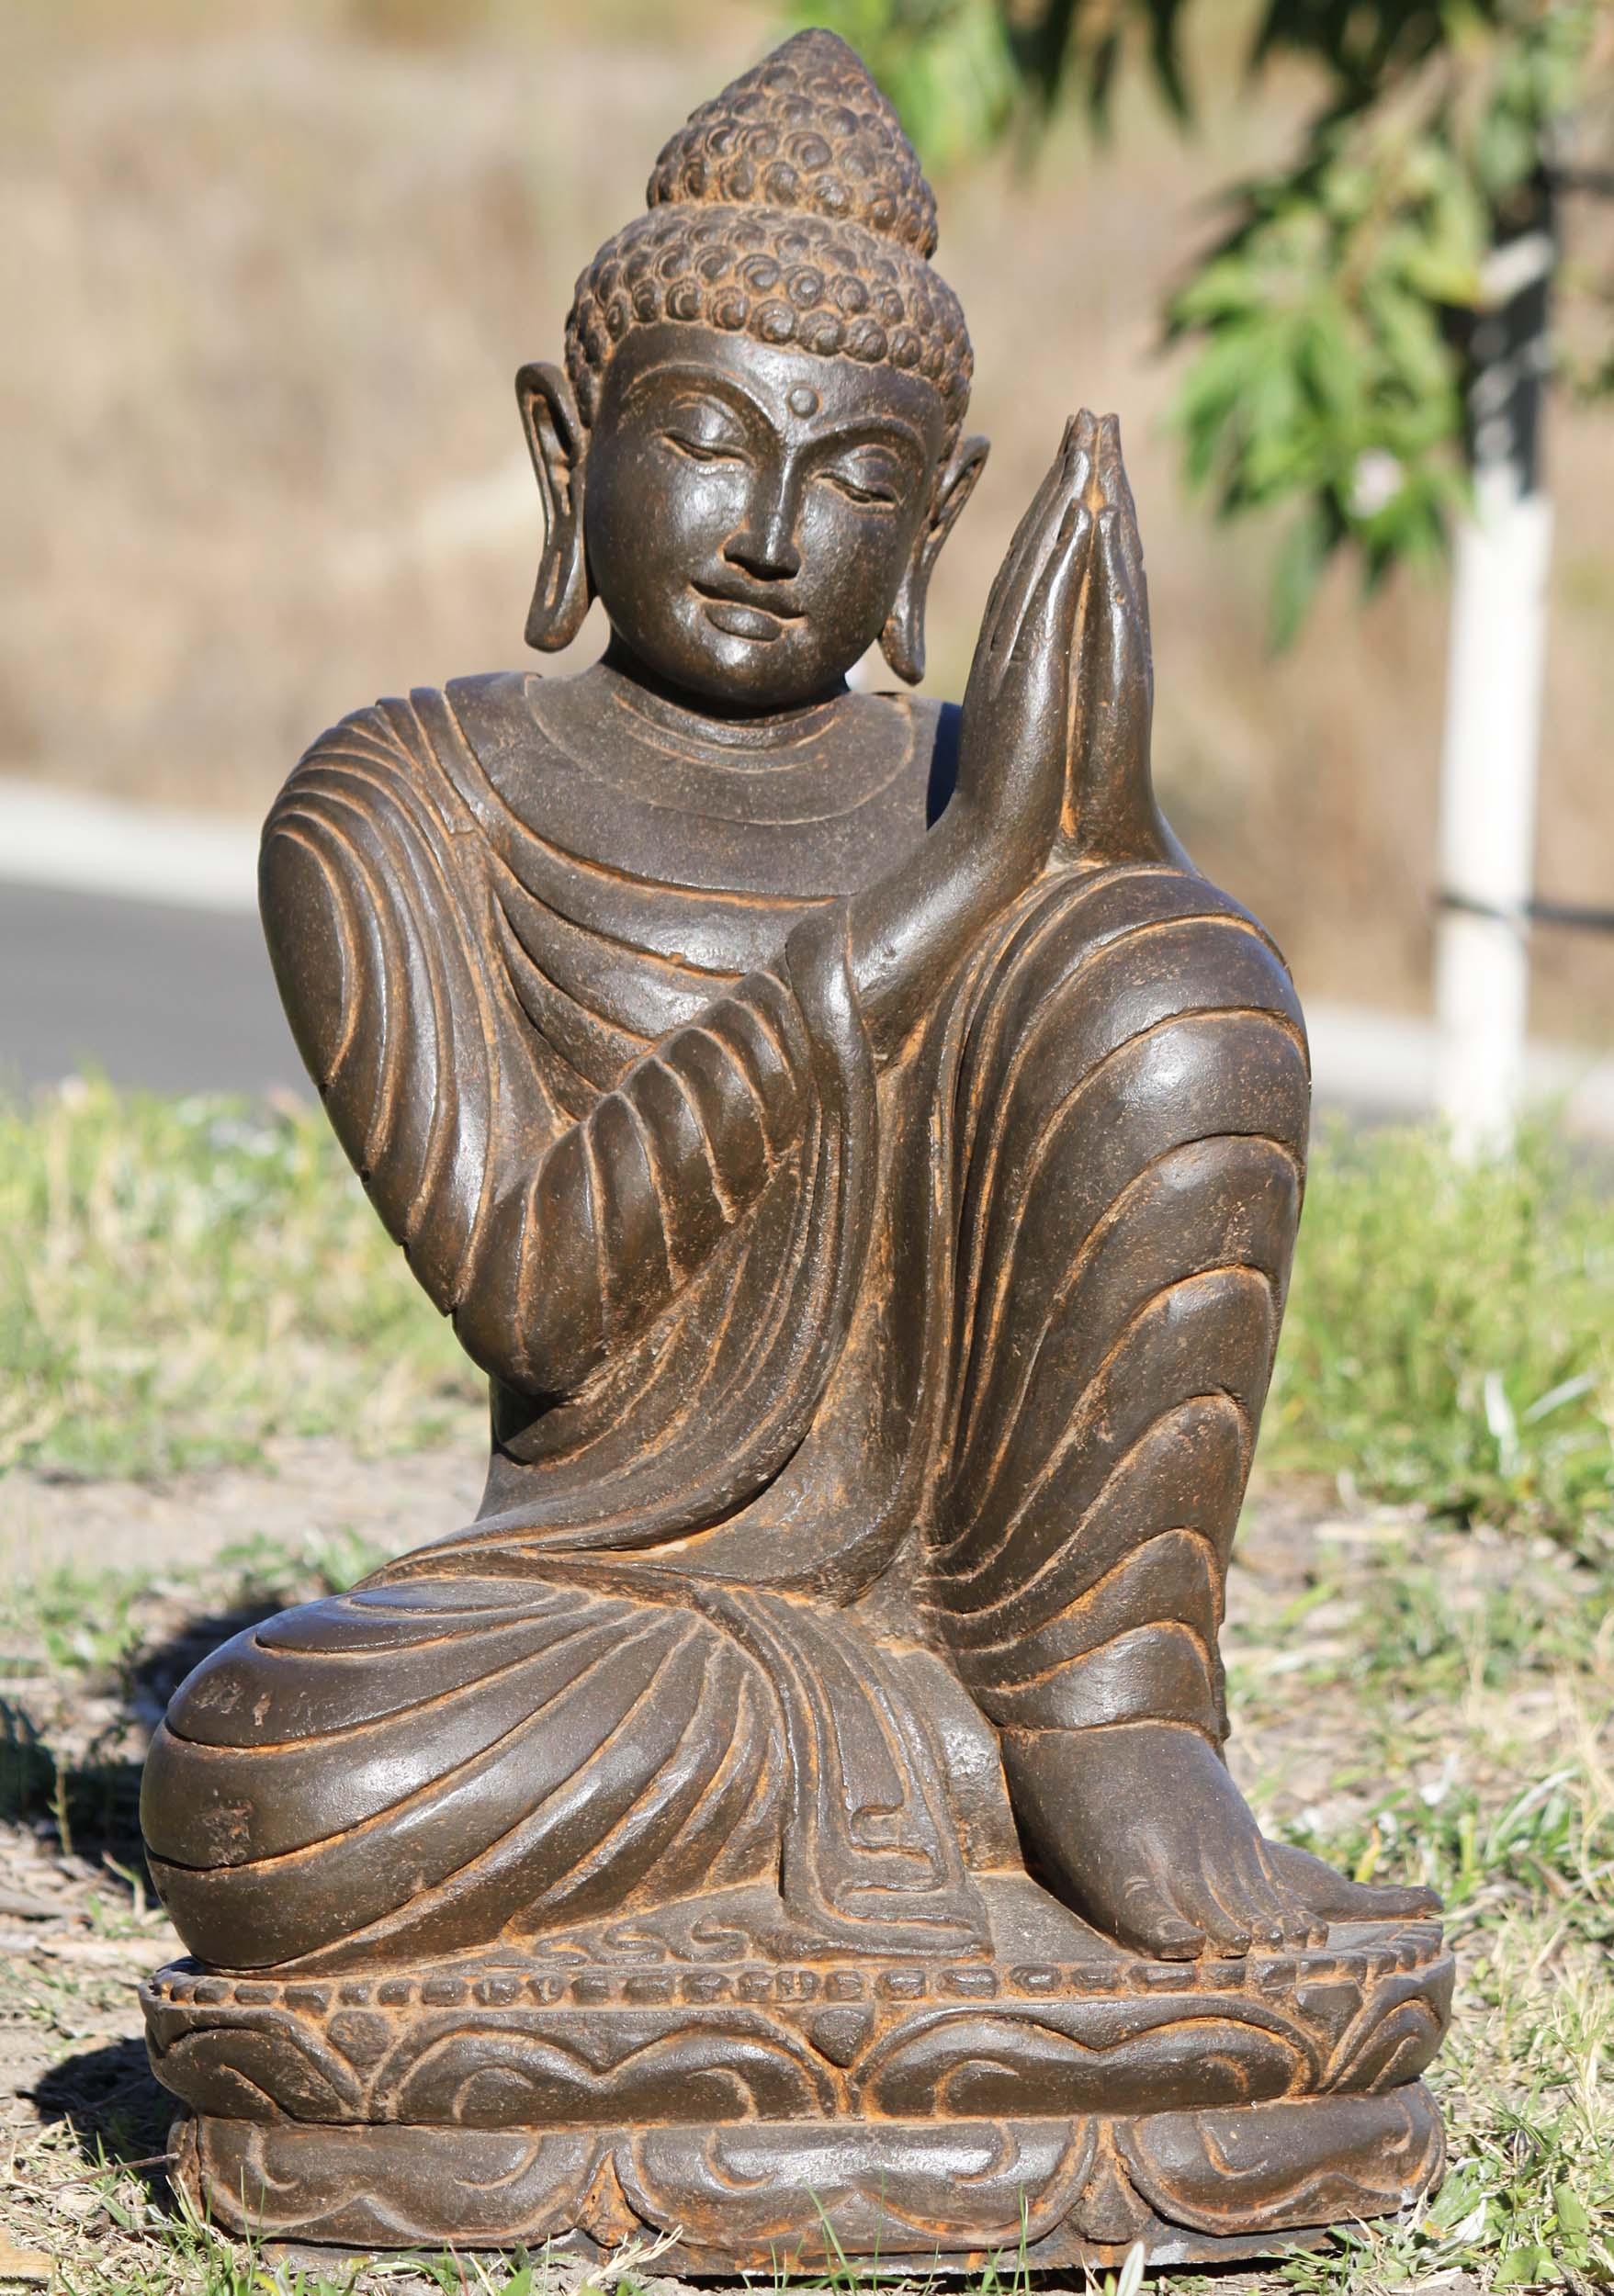 Resting Namaste Buddha Sculpture 28 102ls396a Hindu Gods